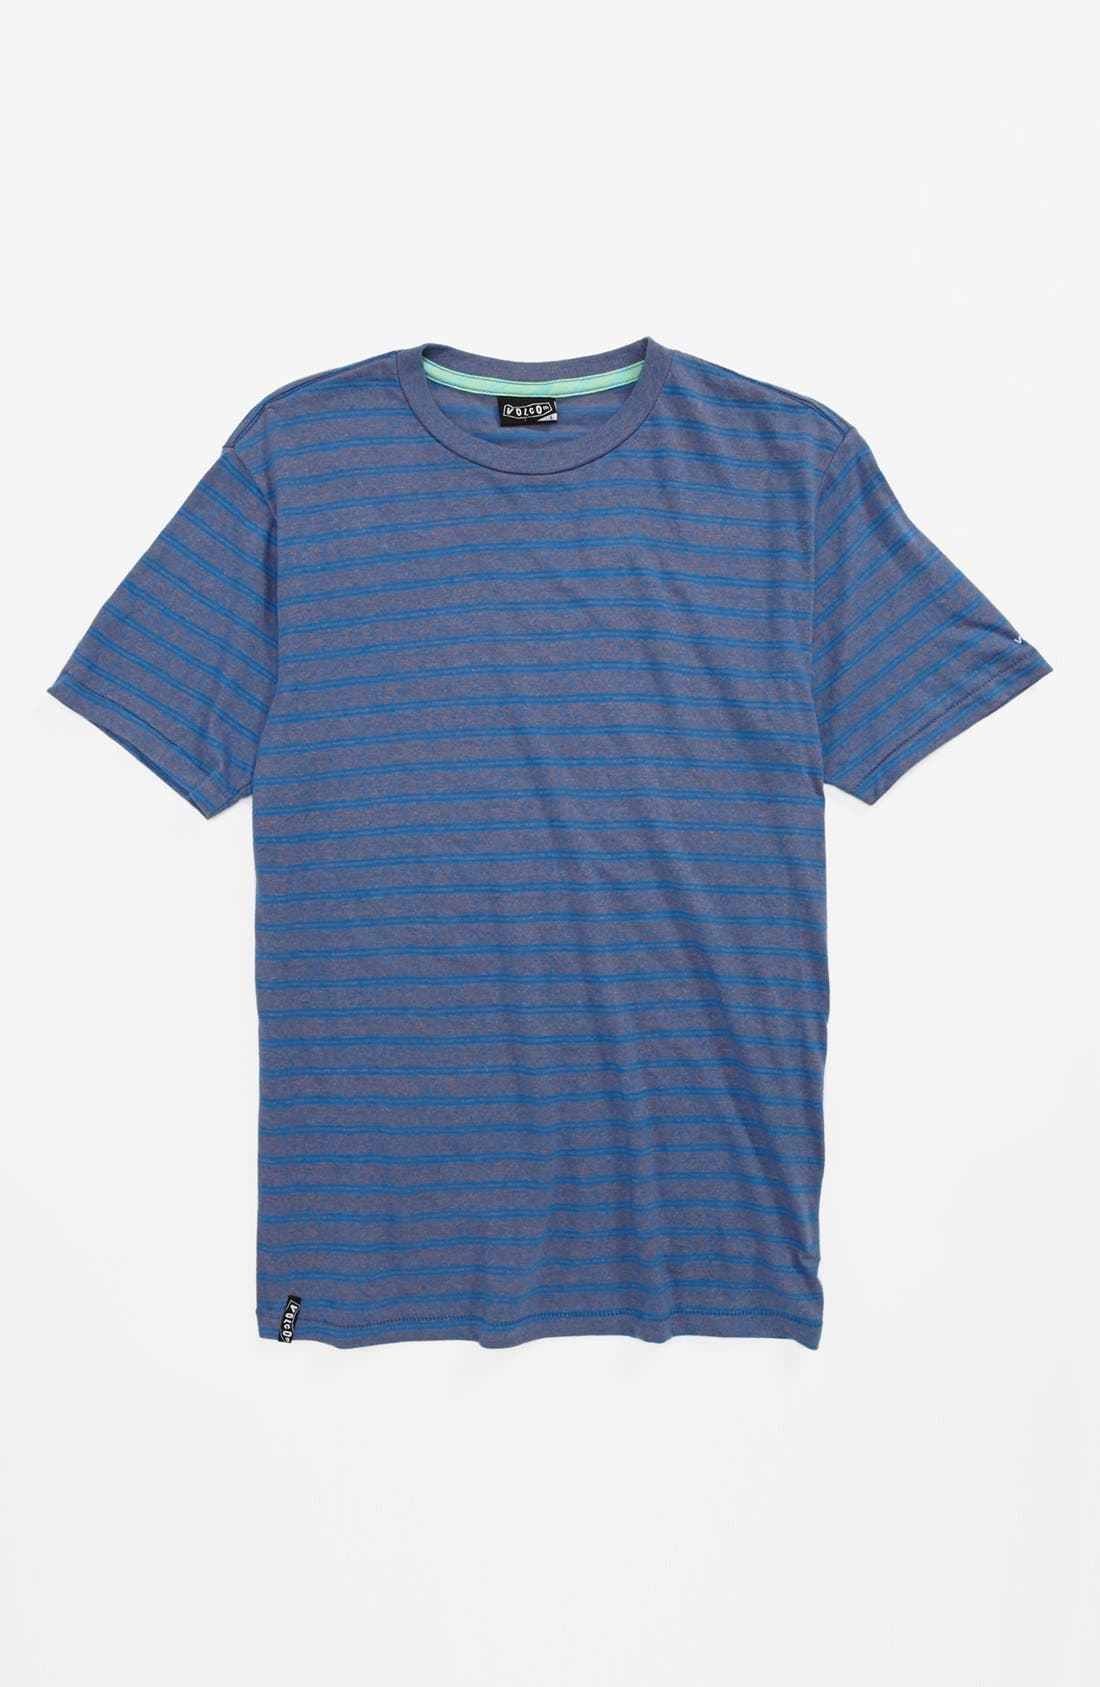 Alternate Image 1 Selected - Volcom 'Redemption' T-Shirt (Big Boys)